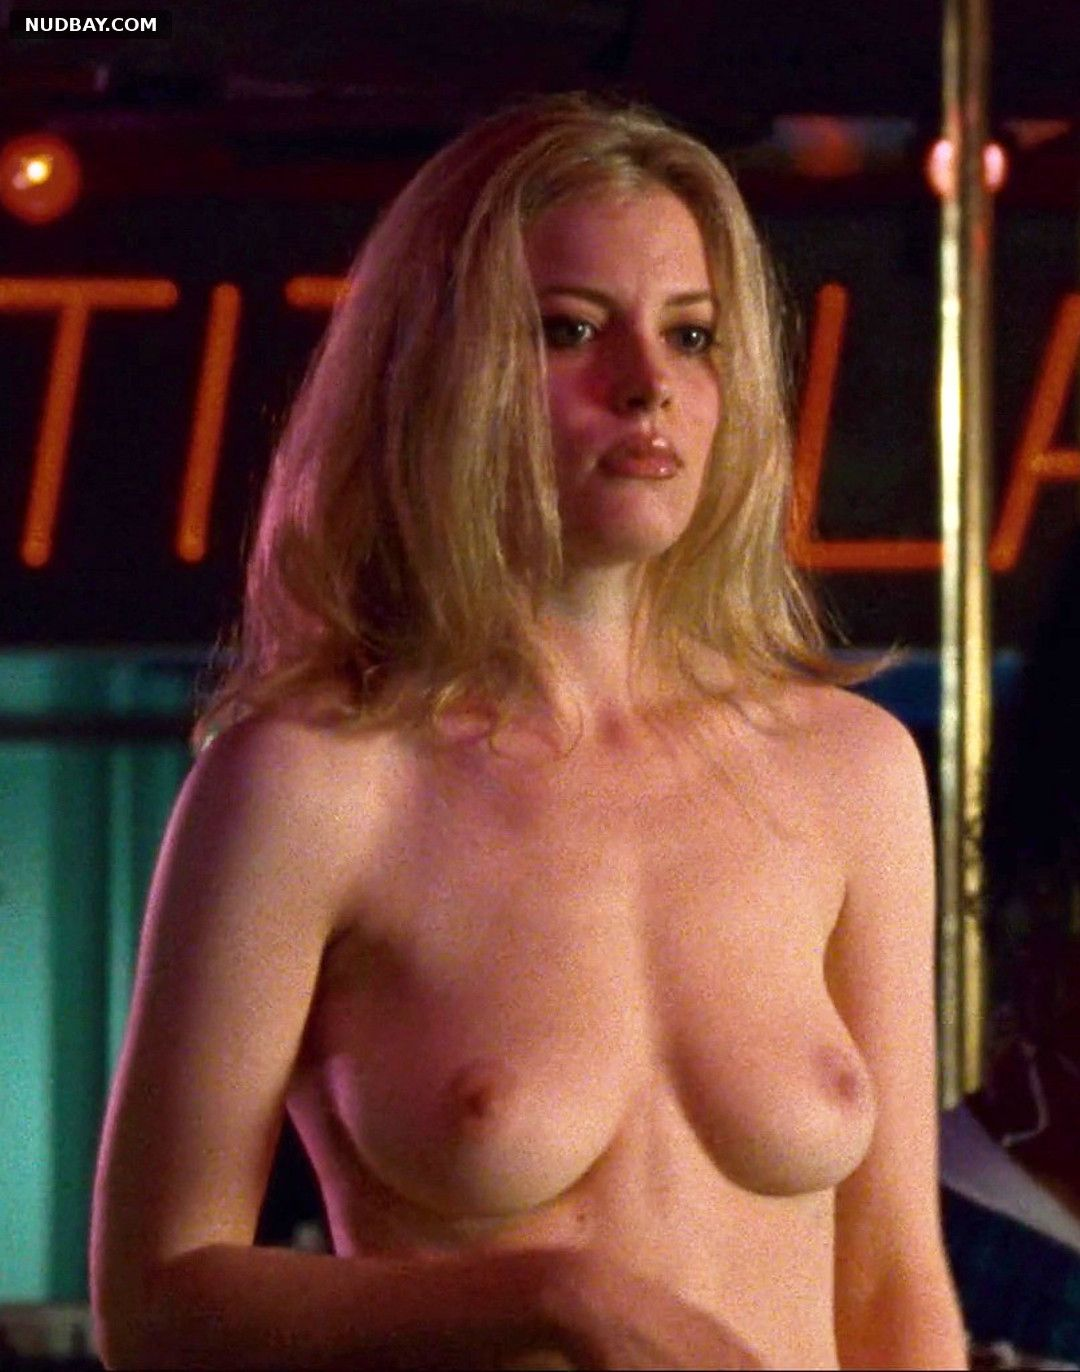 Gillian Jacobs nude in the movie Choke